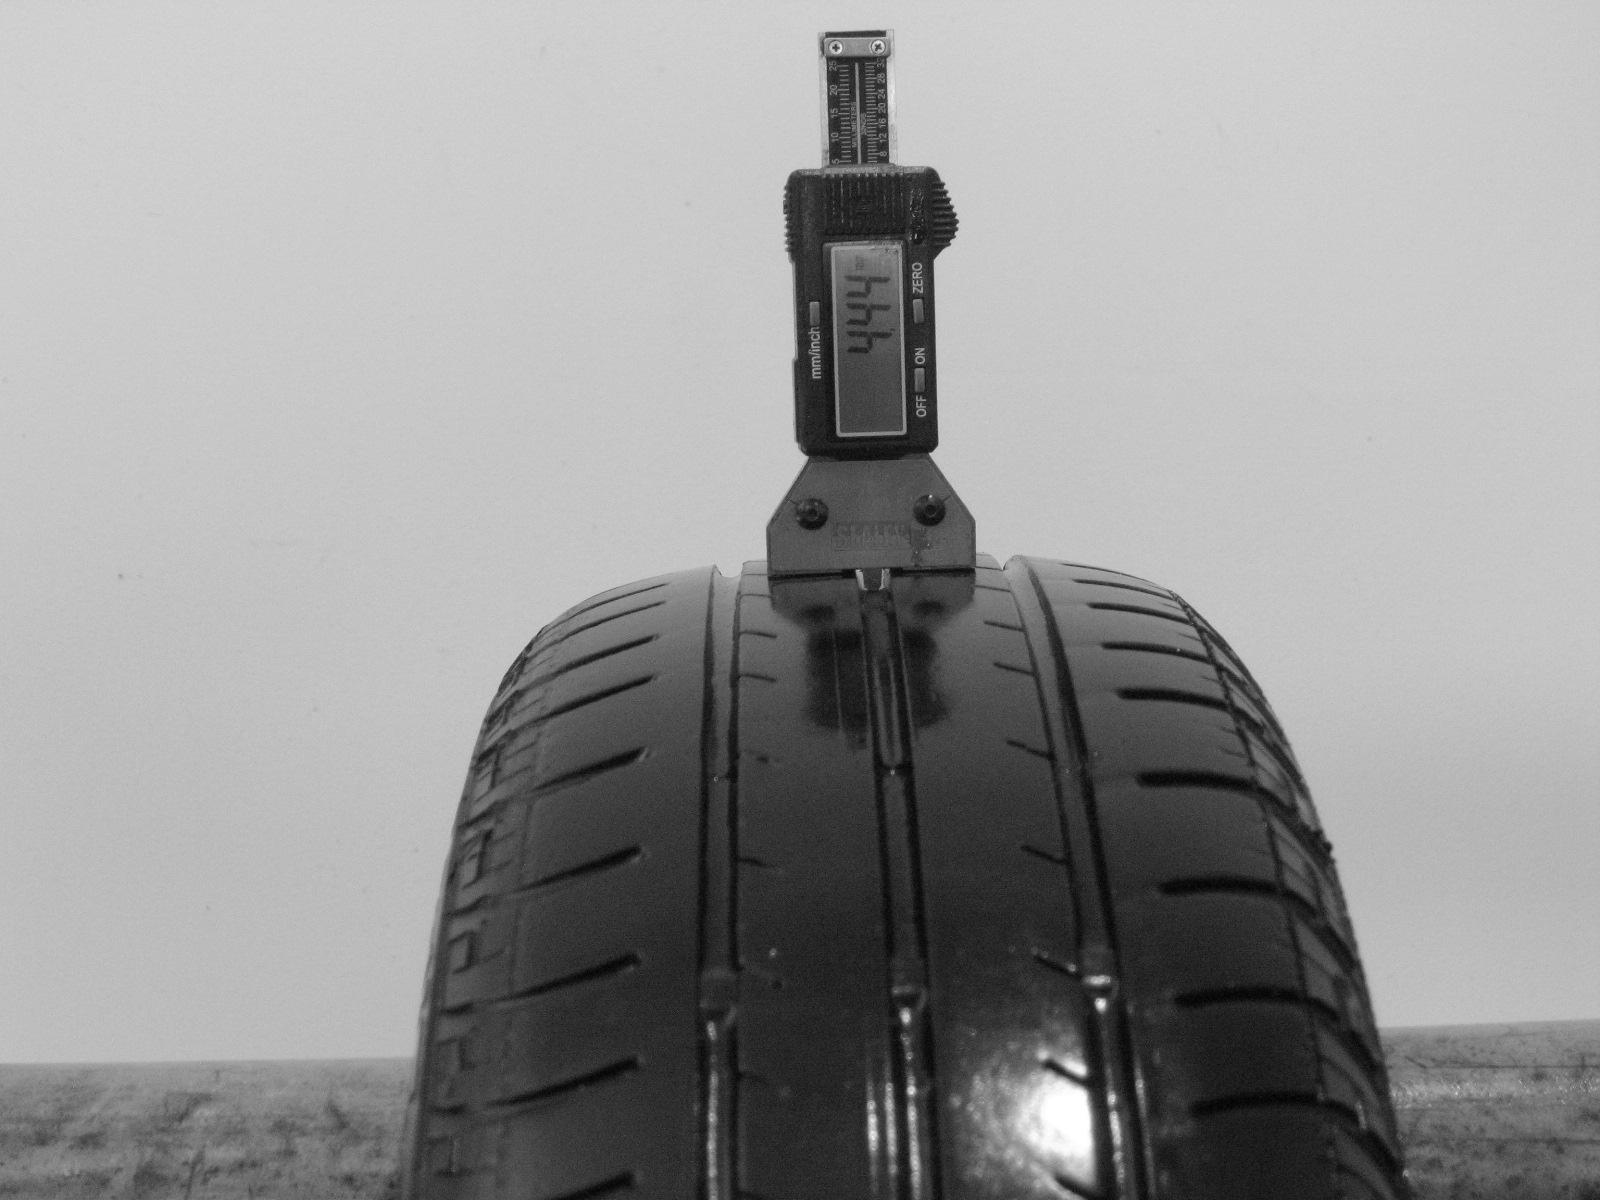 Použité-Pneu-Bazar - 175/65 R14 CONTINENTAL CONTIECOCONTACT EP TYP1 -kusovka-rezerva 3mm